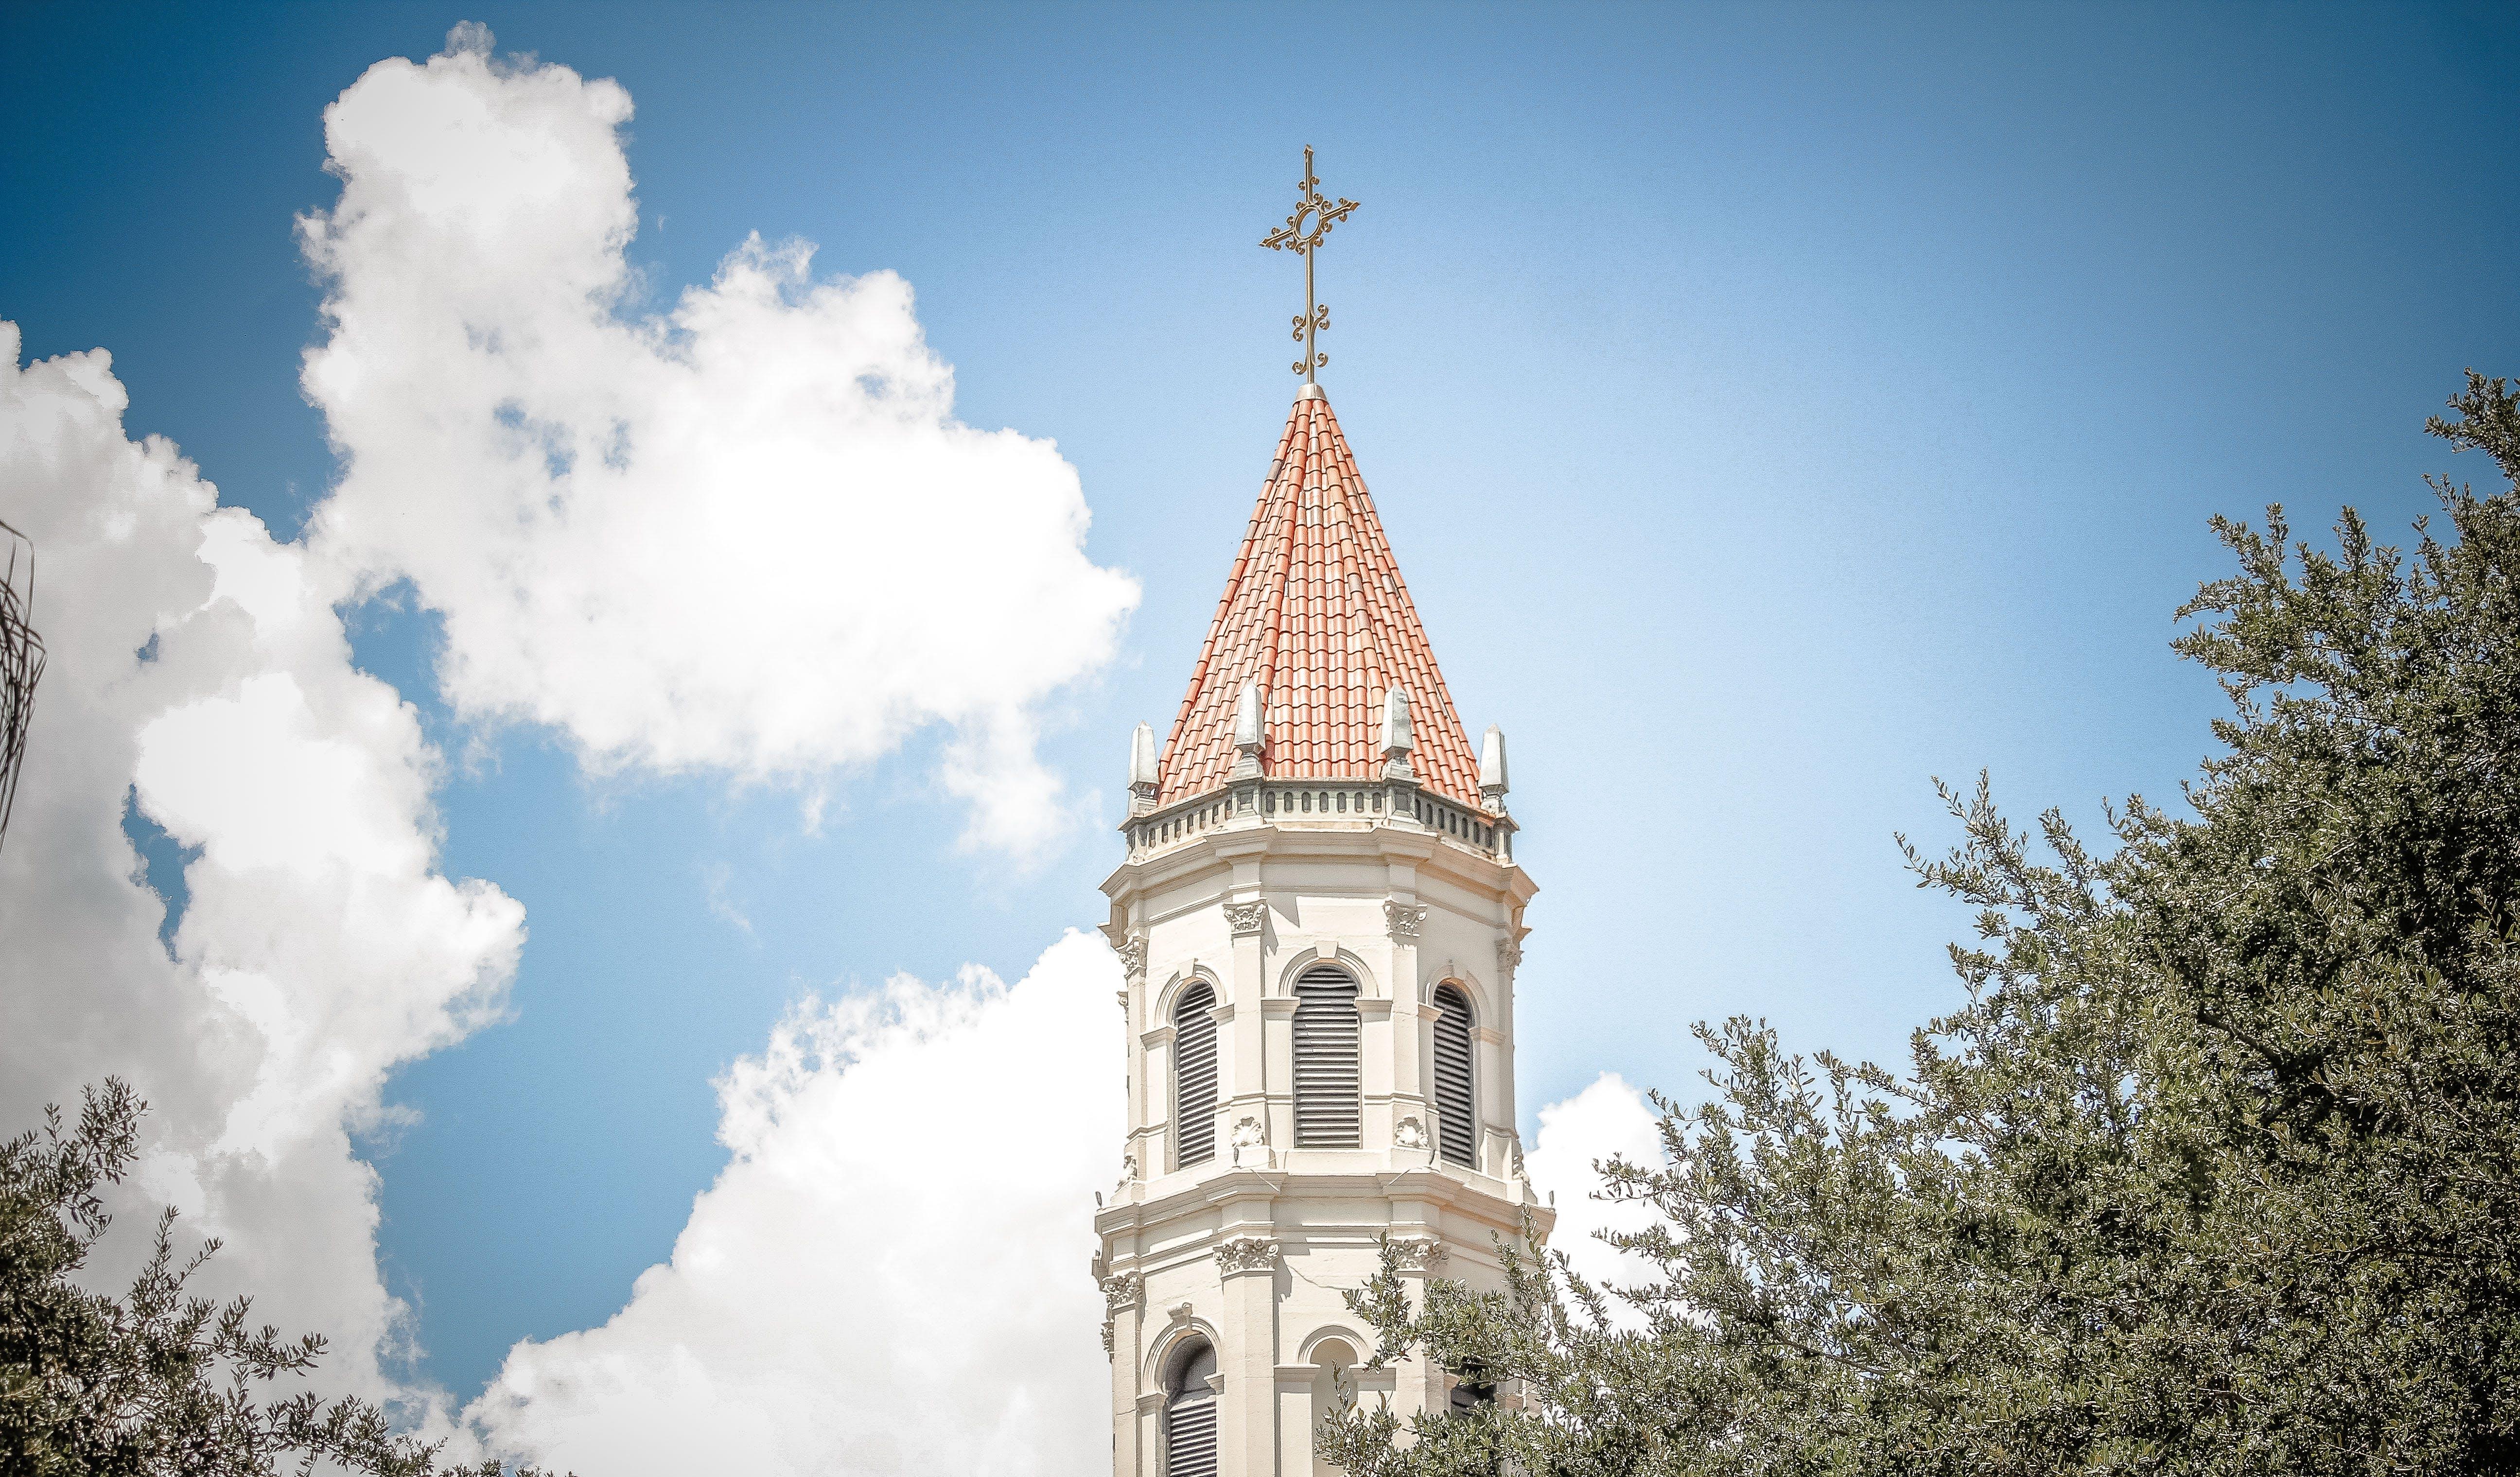 White Concrete Cross Tower